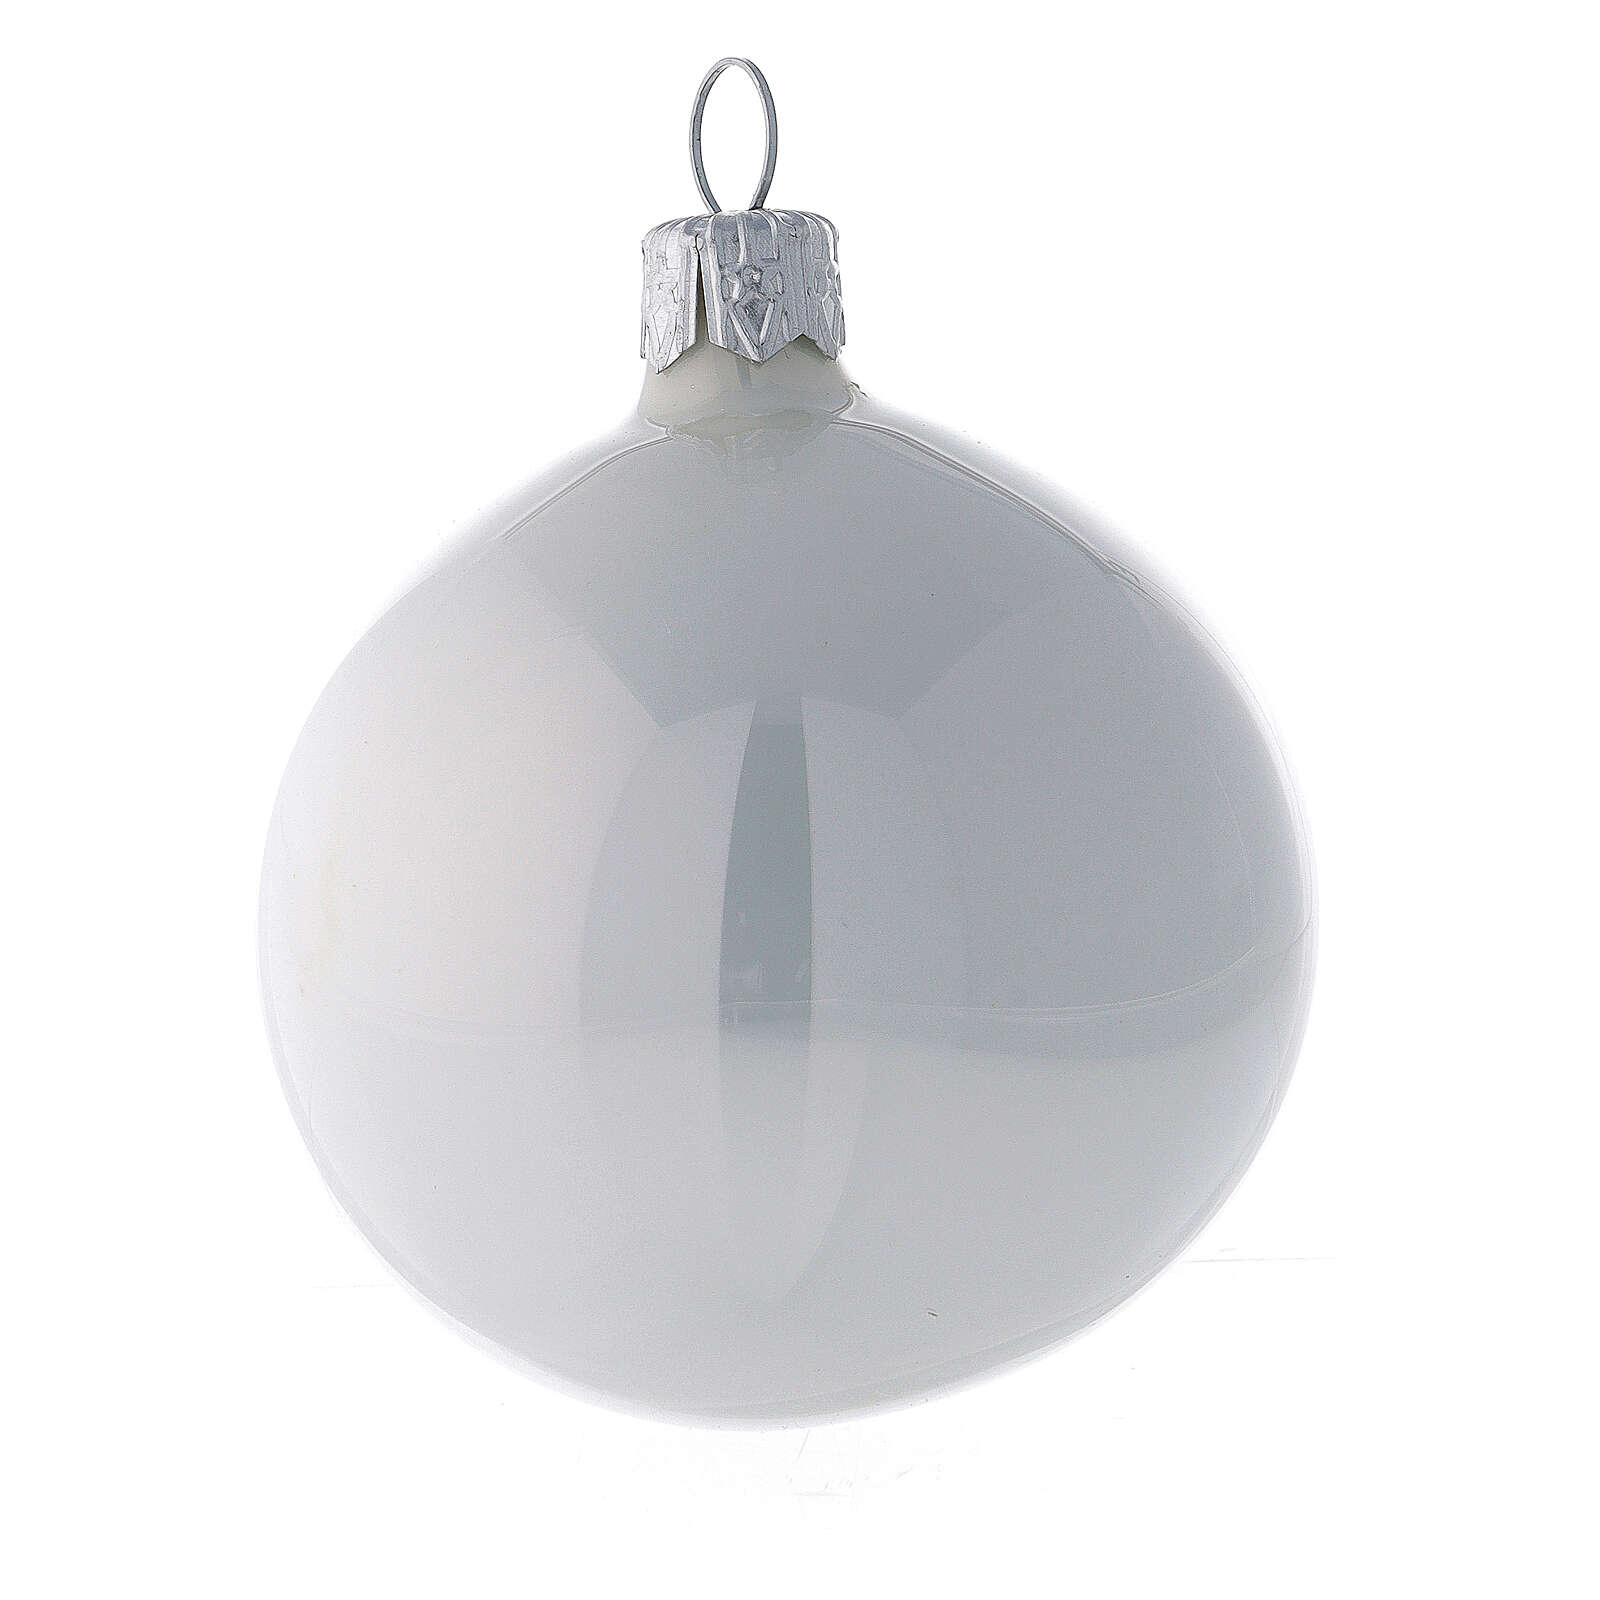 Pearl-white shiny blown glass Christmas balls 6 pcs 6 cm 4